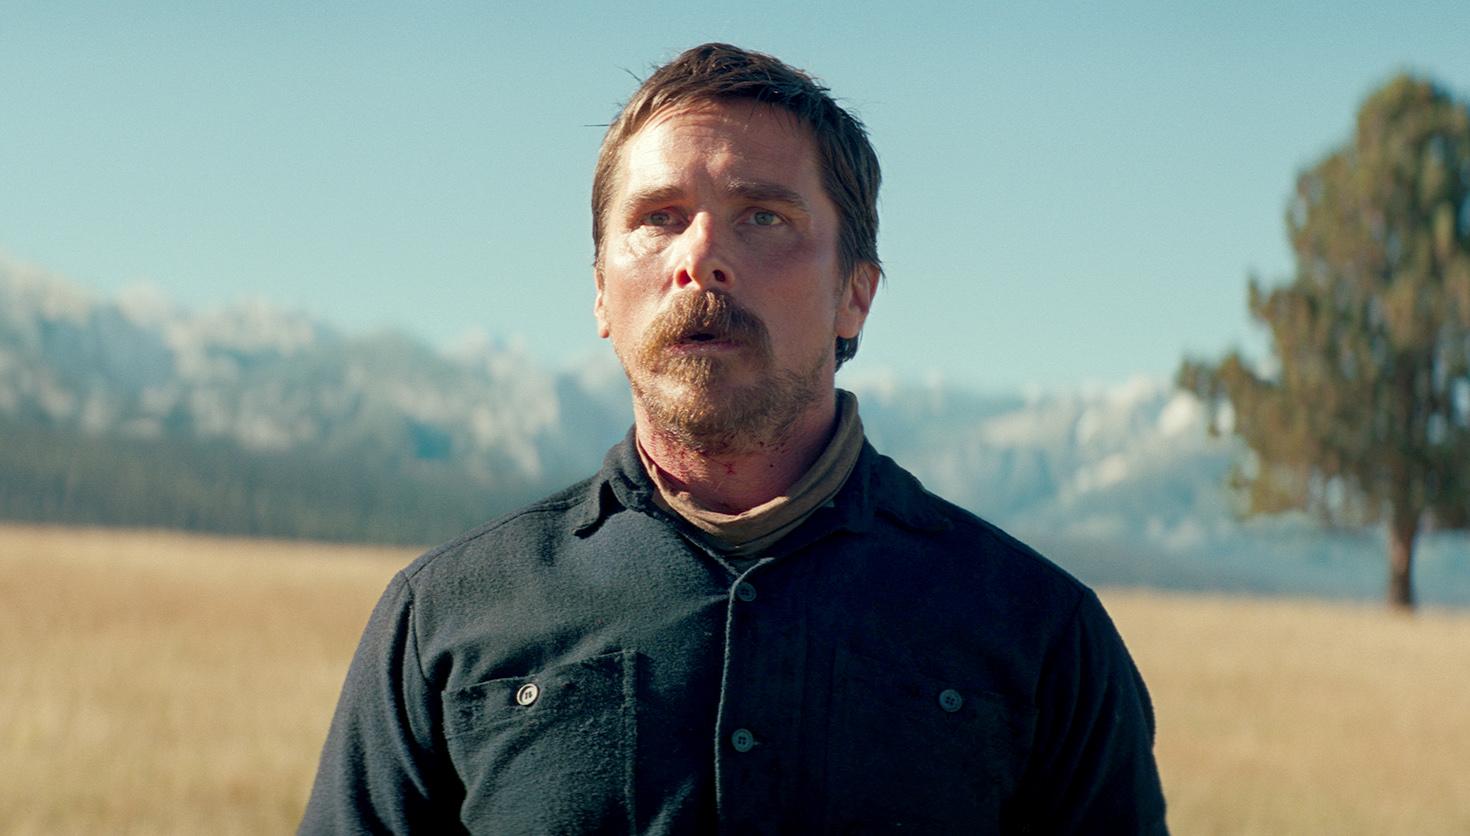 In \'Hostiles,\' an ambitious old-school Western, Christian Bale seems ...